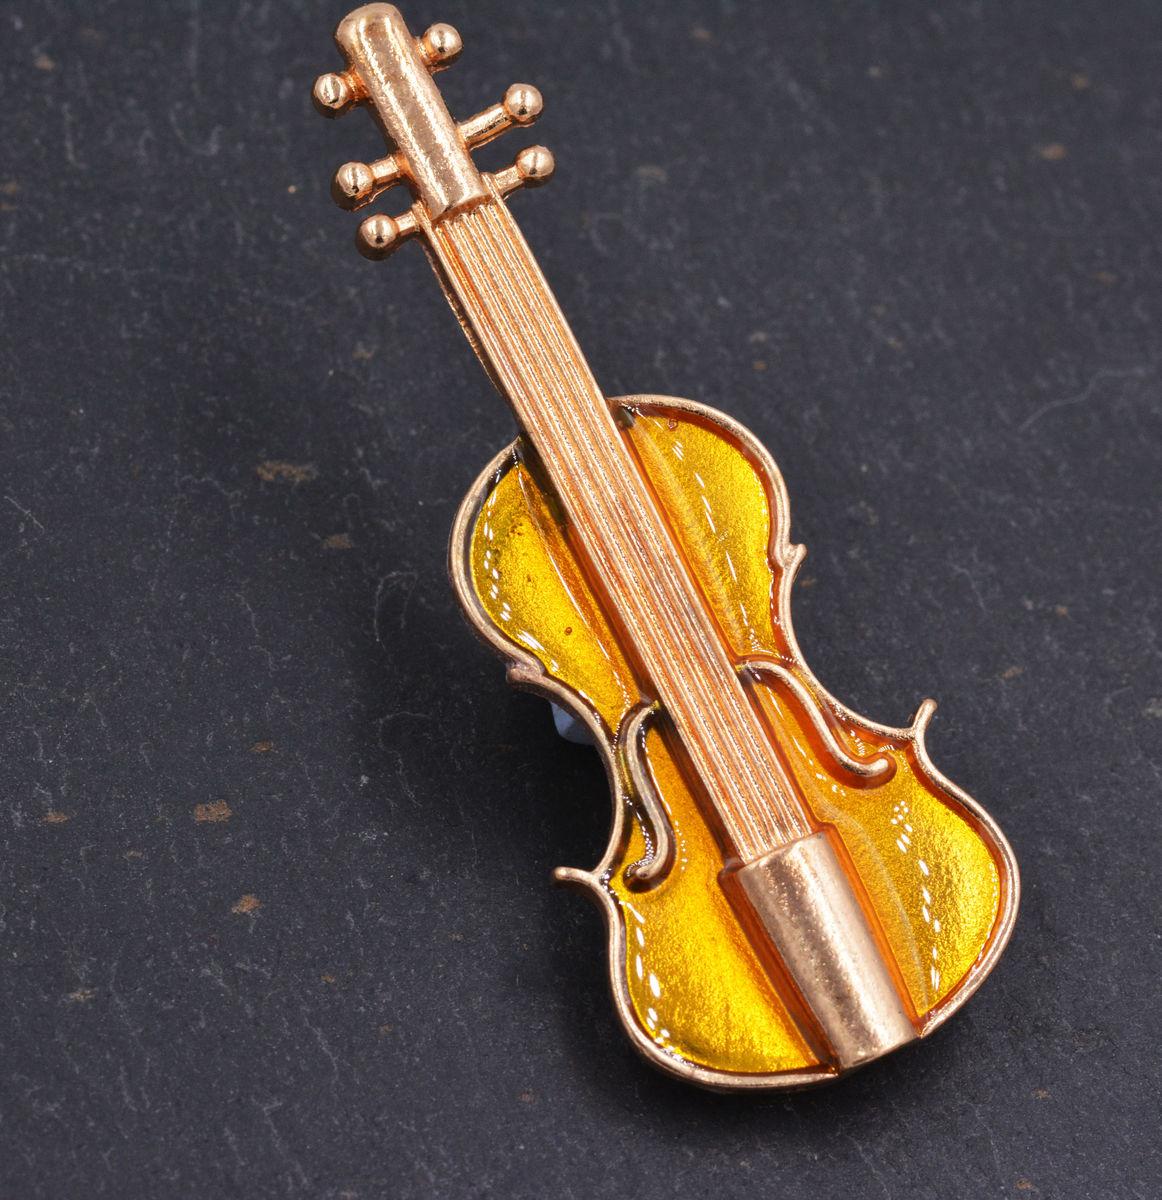 Gold Plated Violin Brooch Enamel Lapel Pin - Cute, Fun and